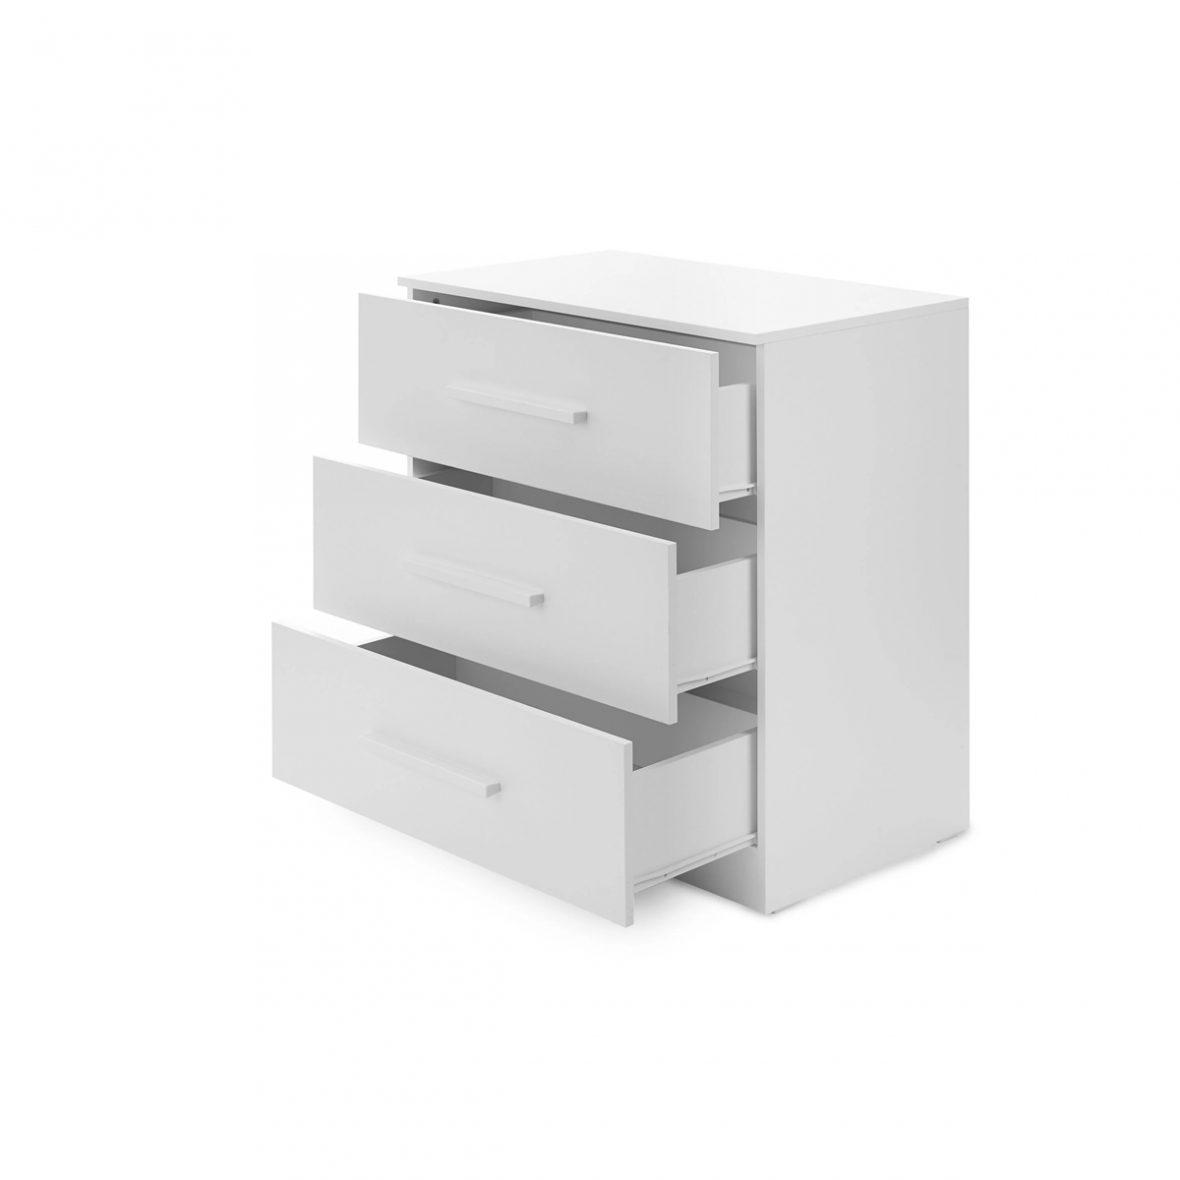 grantham-2-piece-furniture-set-brushed-white-new-